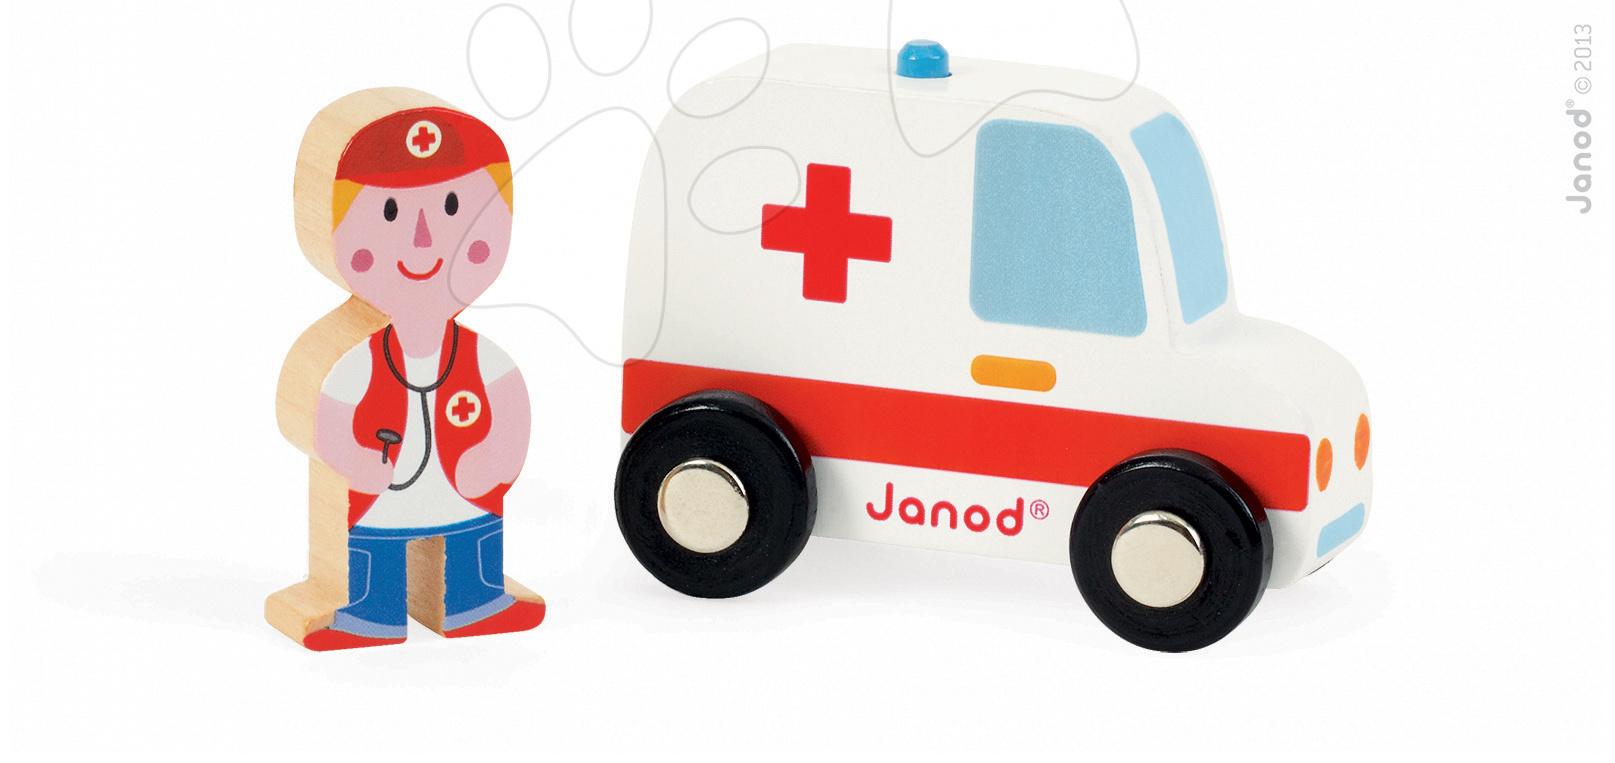 Garáže - Drevená sanitka Story Set Janod s lekárom 2 dieliky